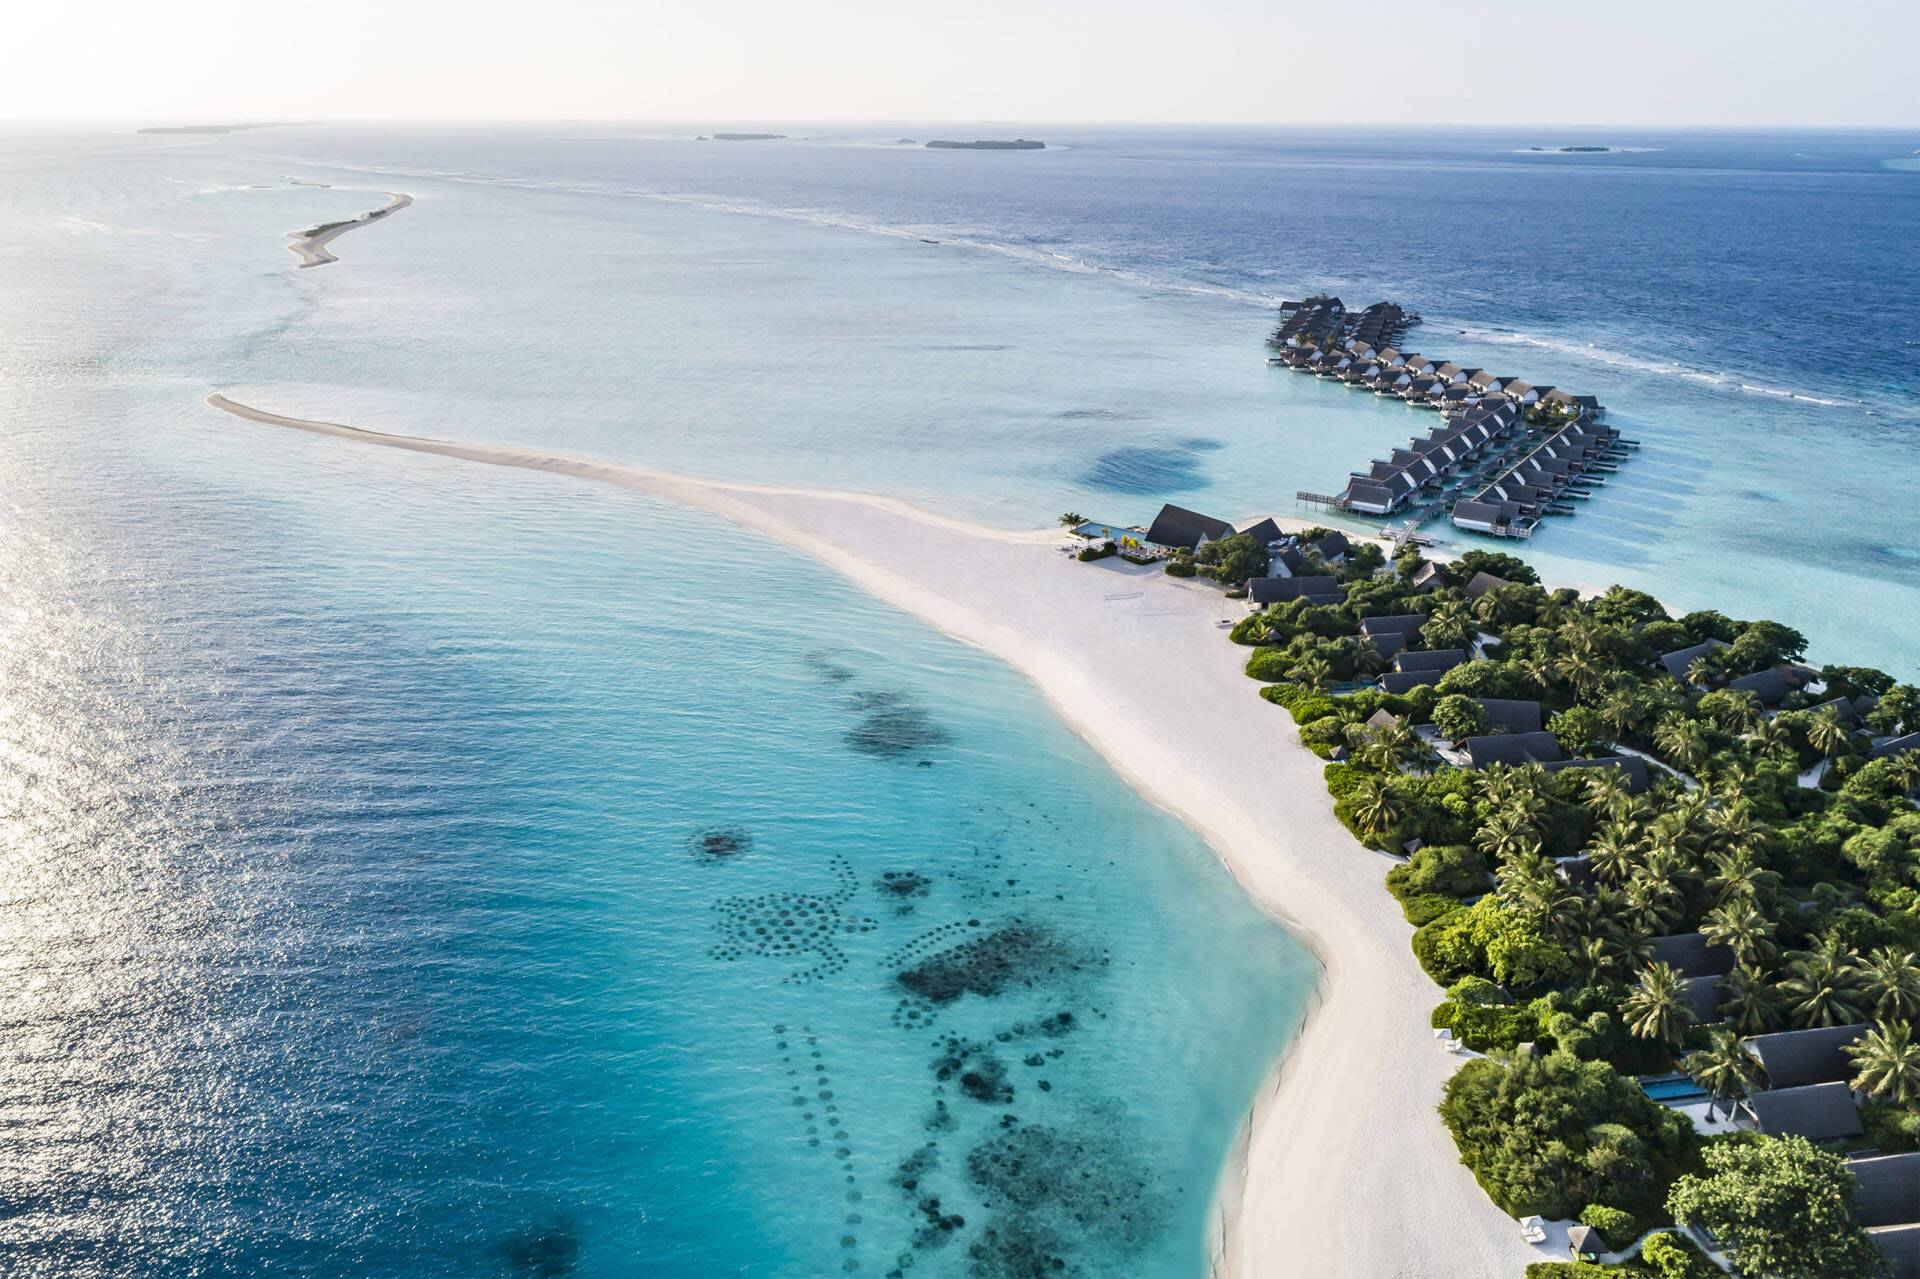 Four Seasons Landaa Giraavaru Maldives Vue Aerienne